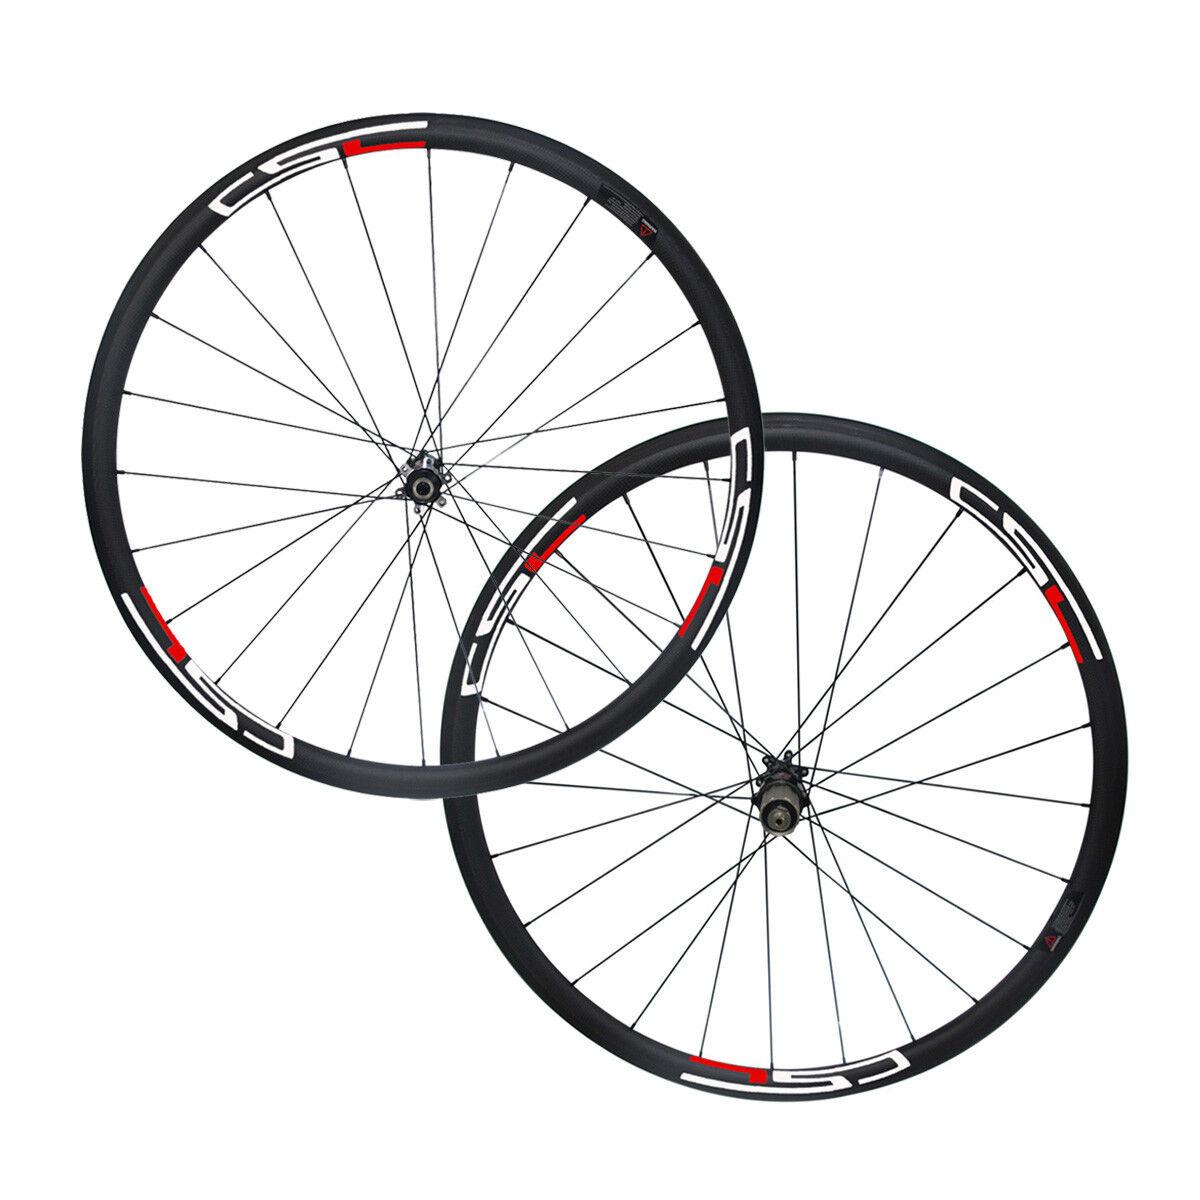 Super Light Disc Brake 38mm Carbon Cyclocross Bike Wheelset  D411SB D412SB Hub  cheaper prices